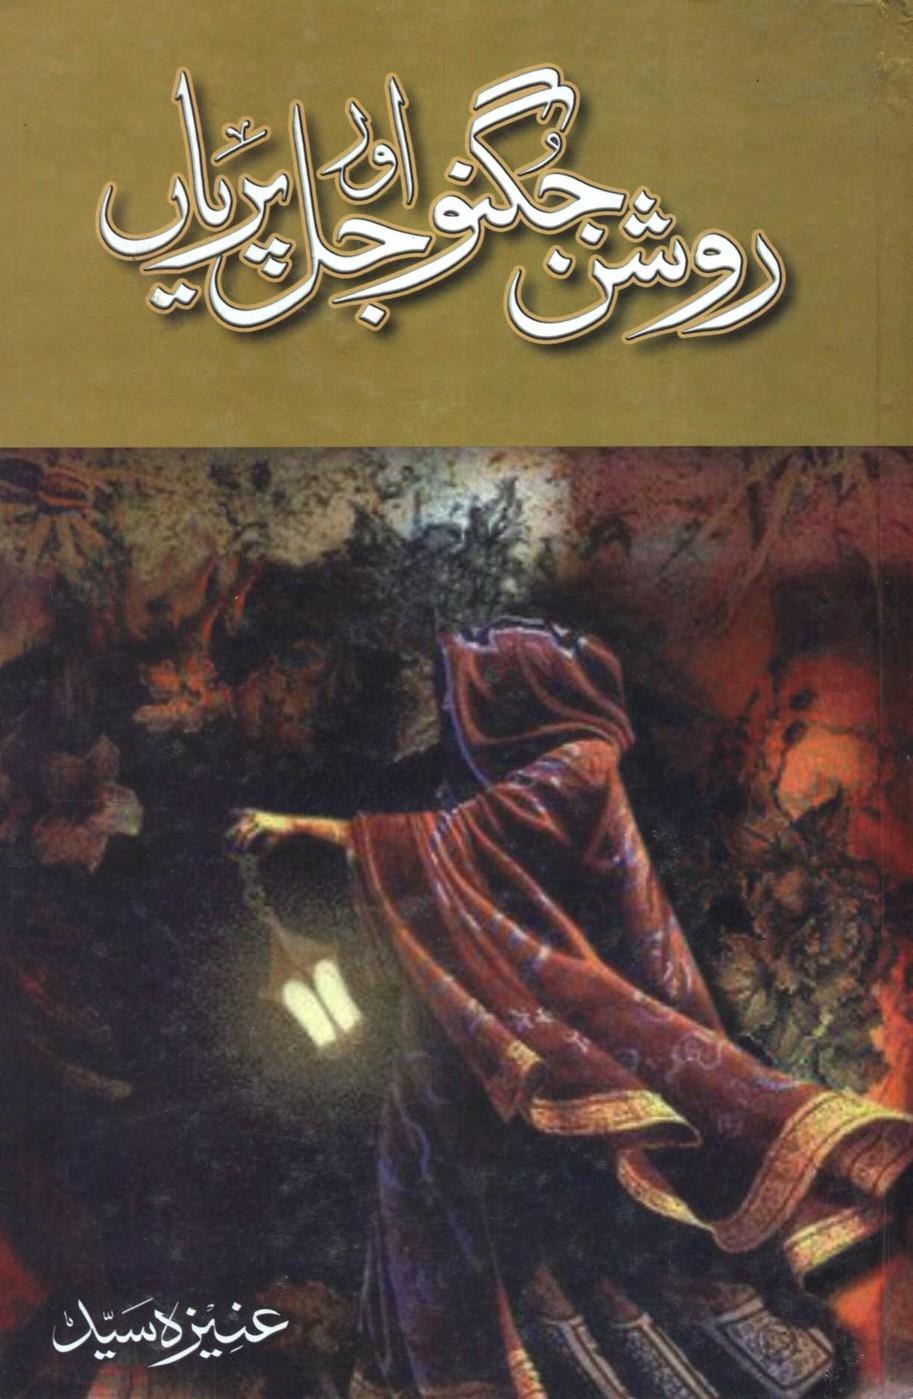 the hobbit book online free pdf